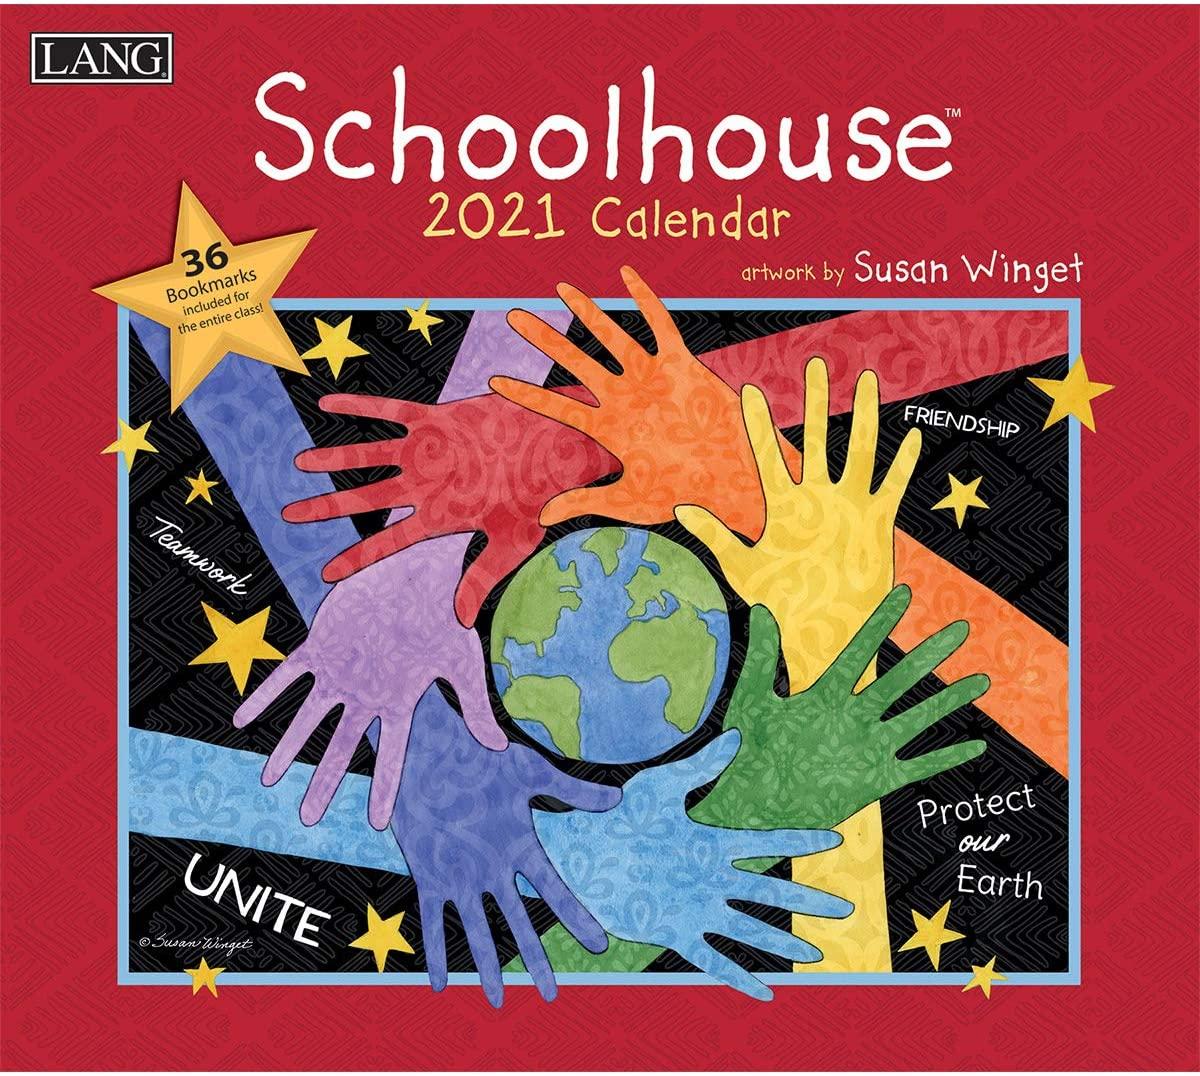 LANG Schoolhouse 2021 Wall Calendar (21991001940)